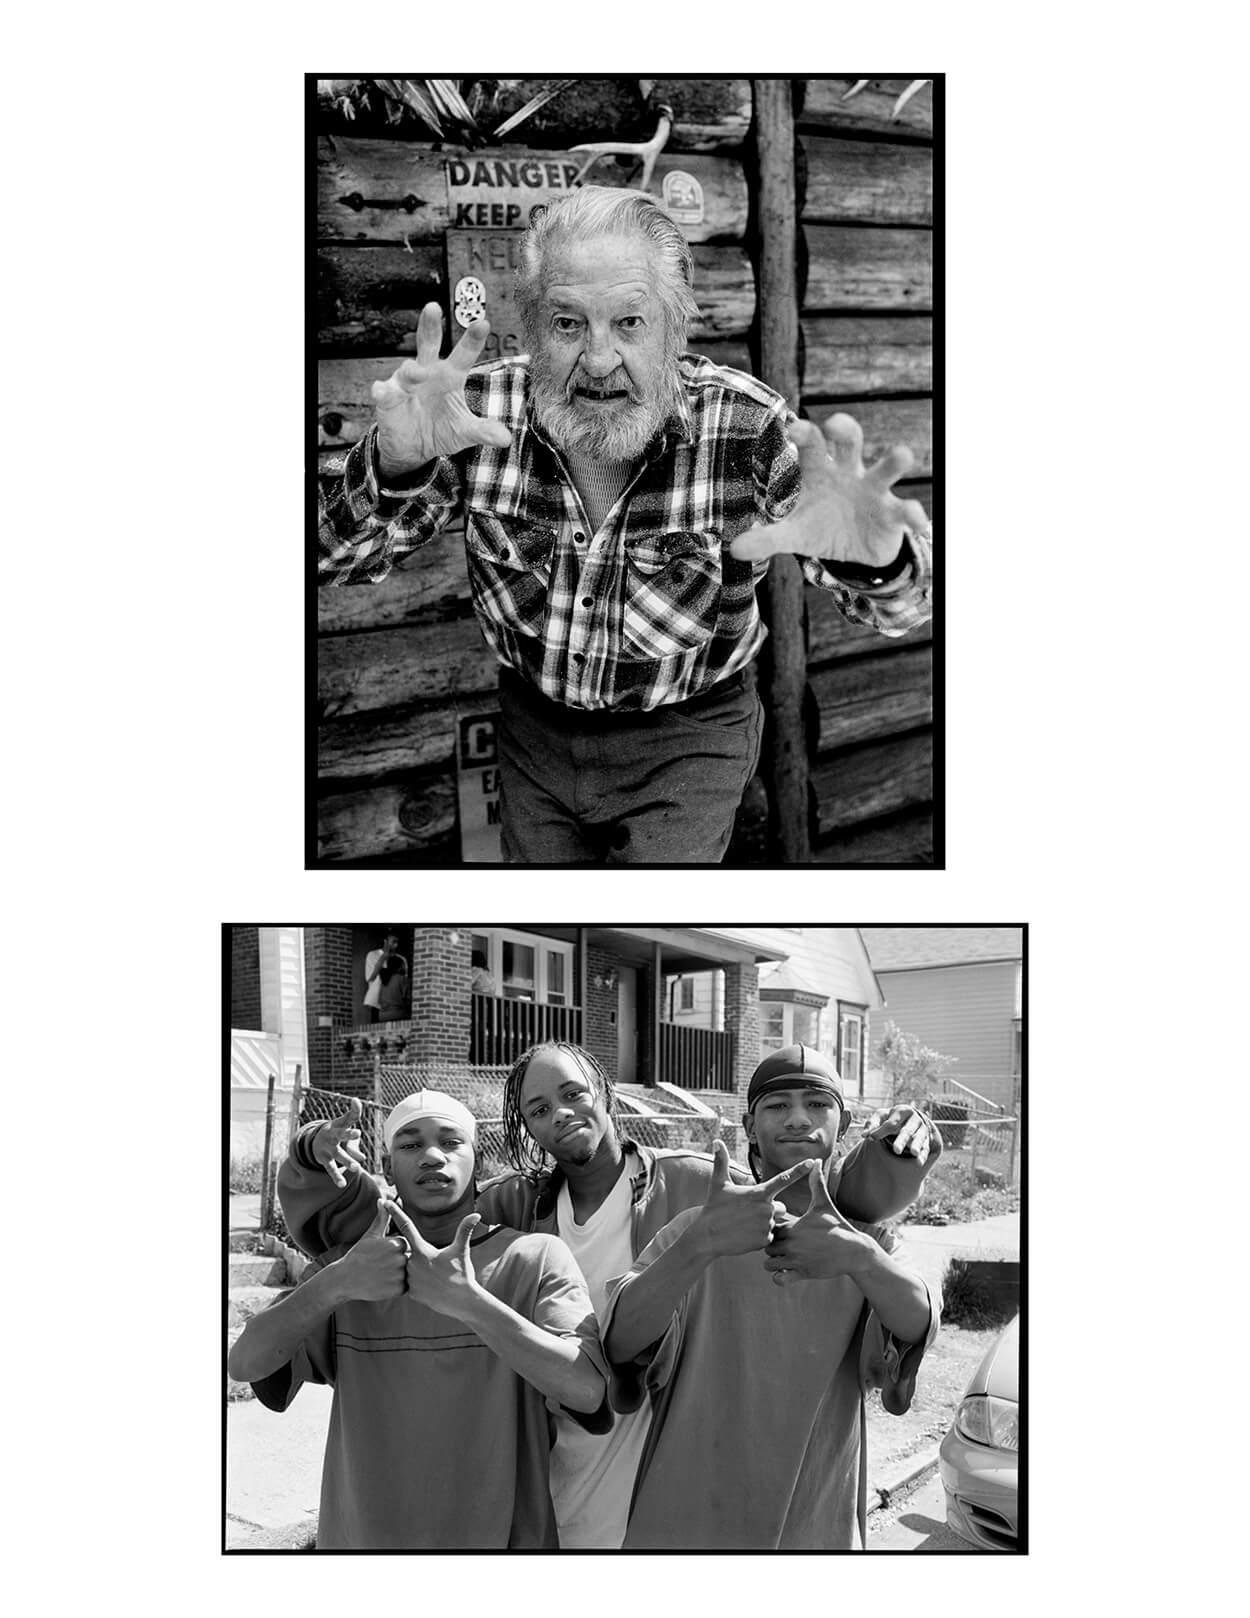 Hunter Barnes documents America's fringe communities in Roadbook - Popular Photography - Popular Photography - Page 4